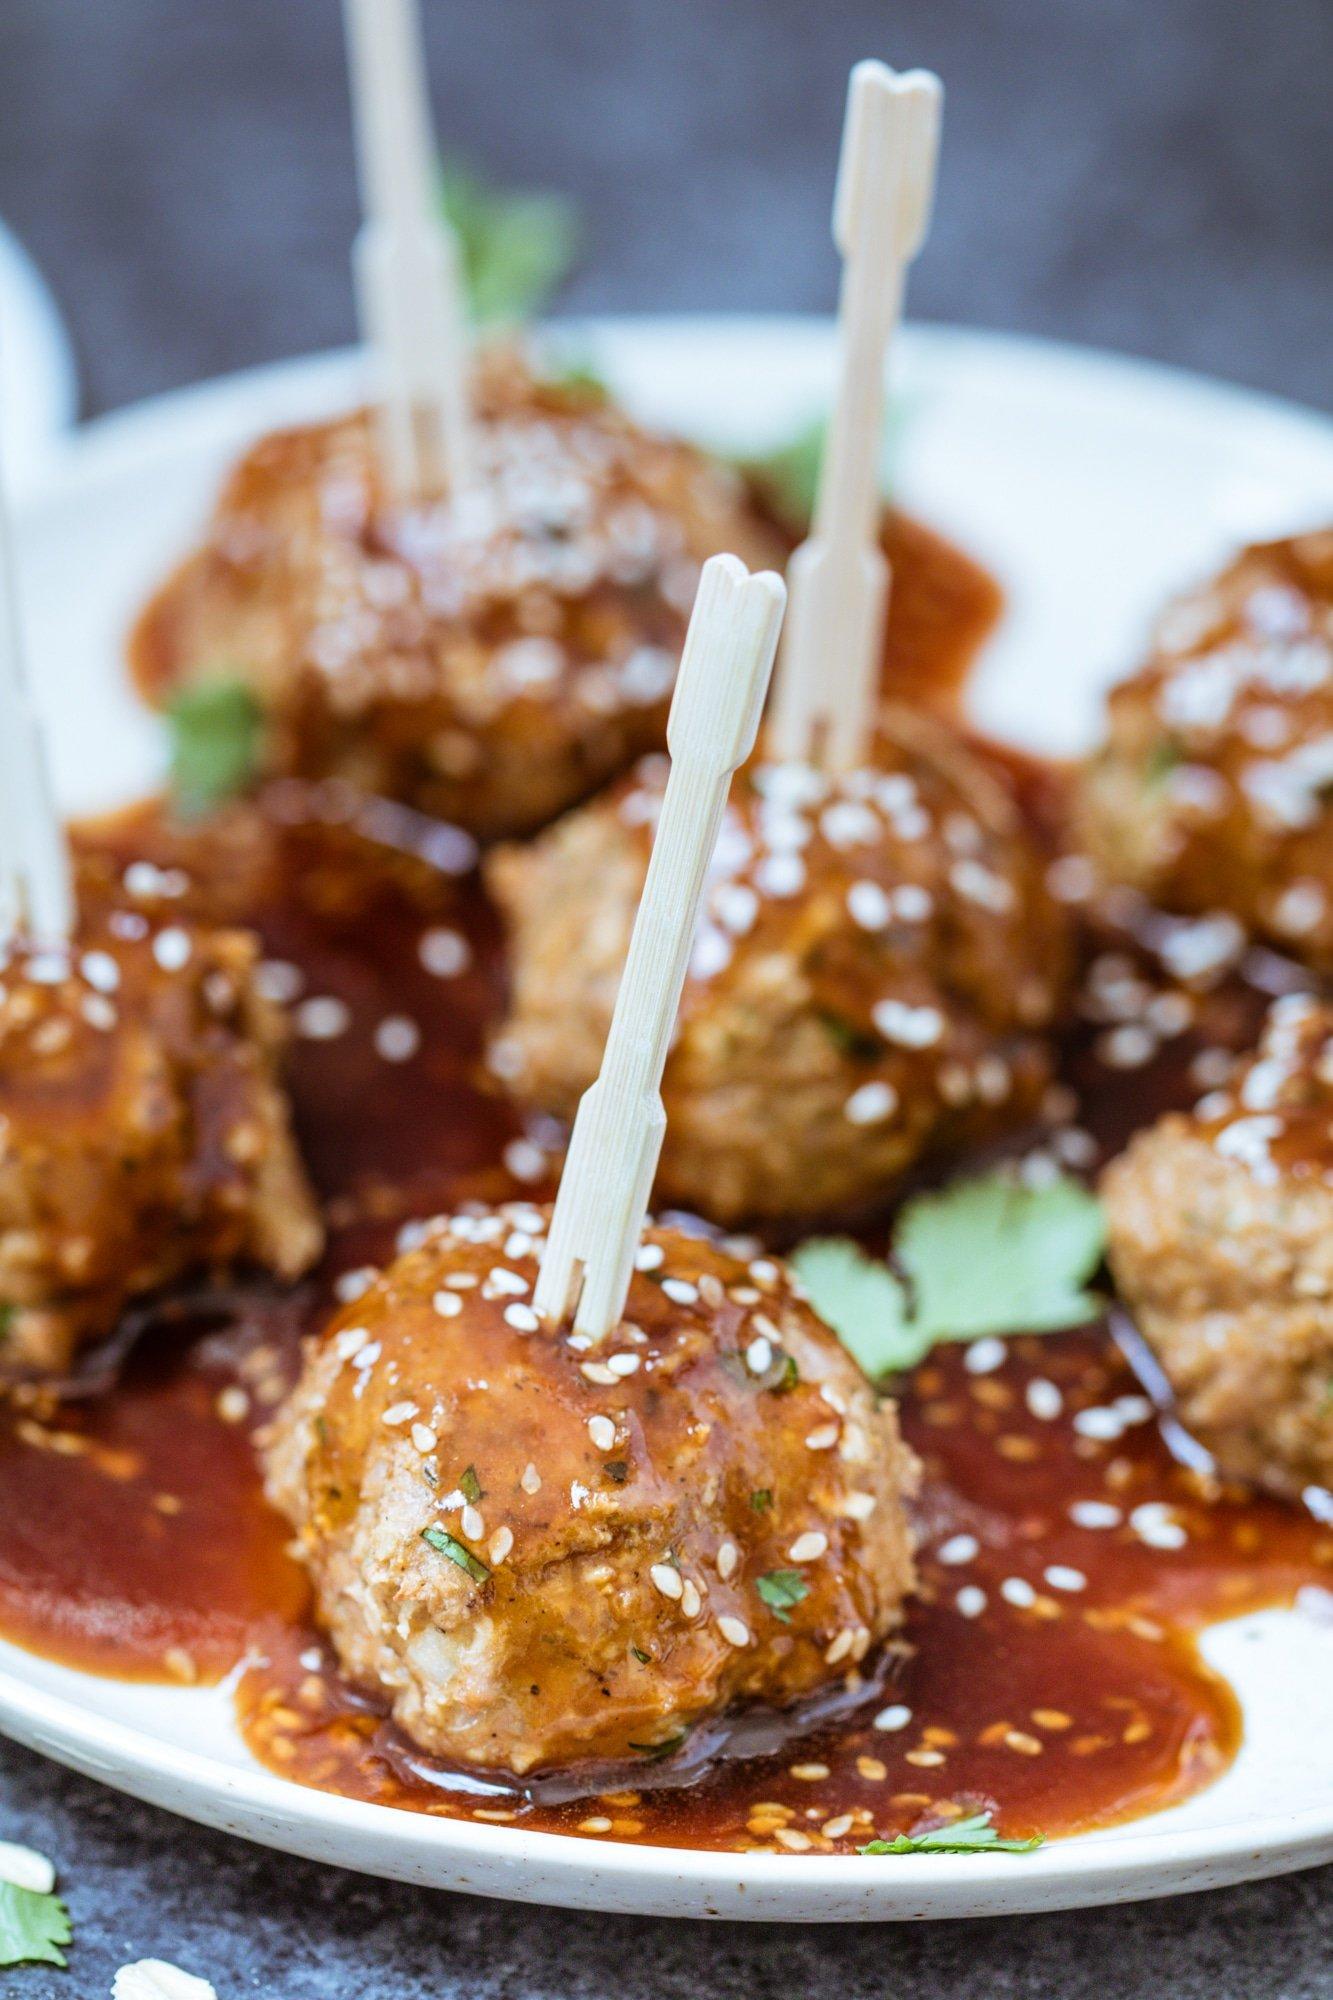 Sriracha Teriyaki Ground Turkey Meatballs